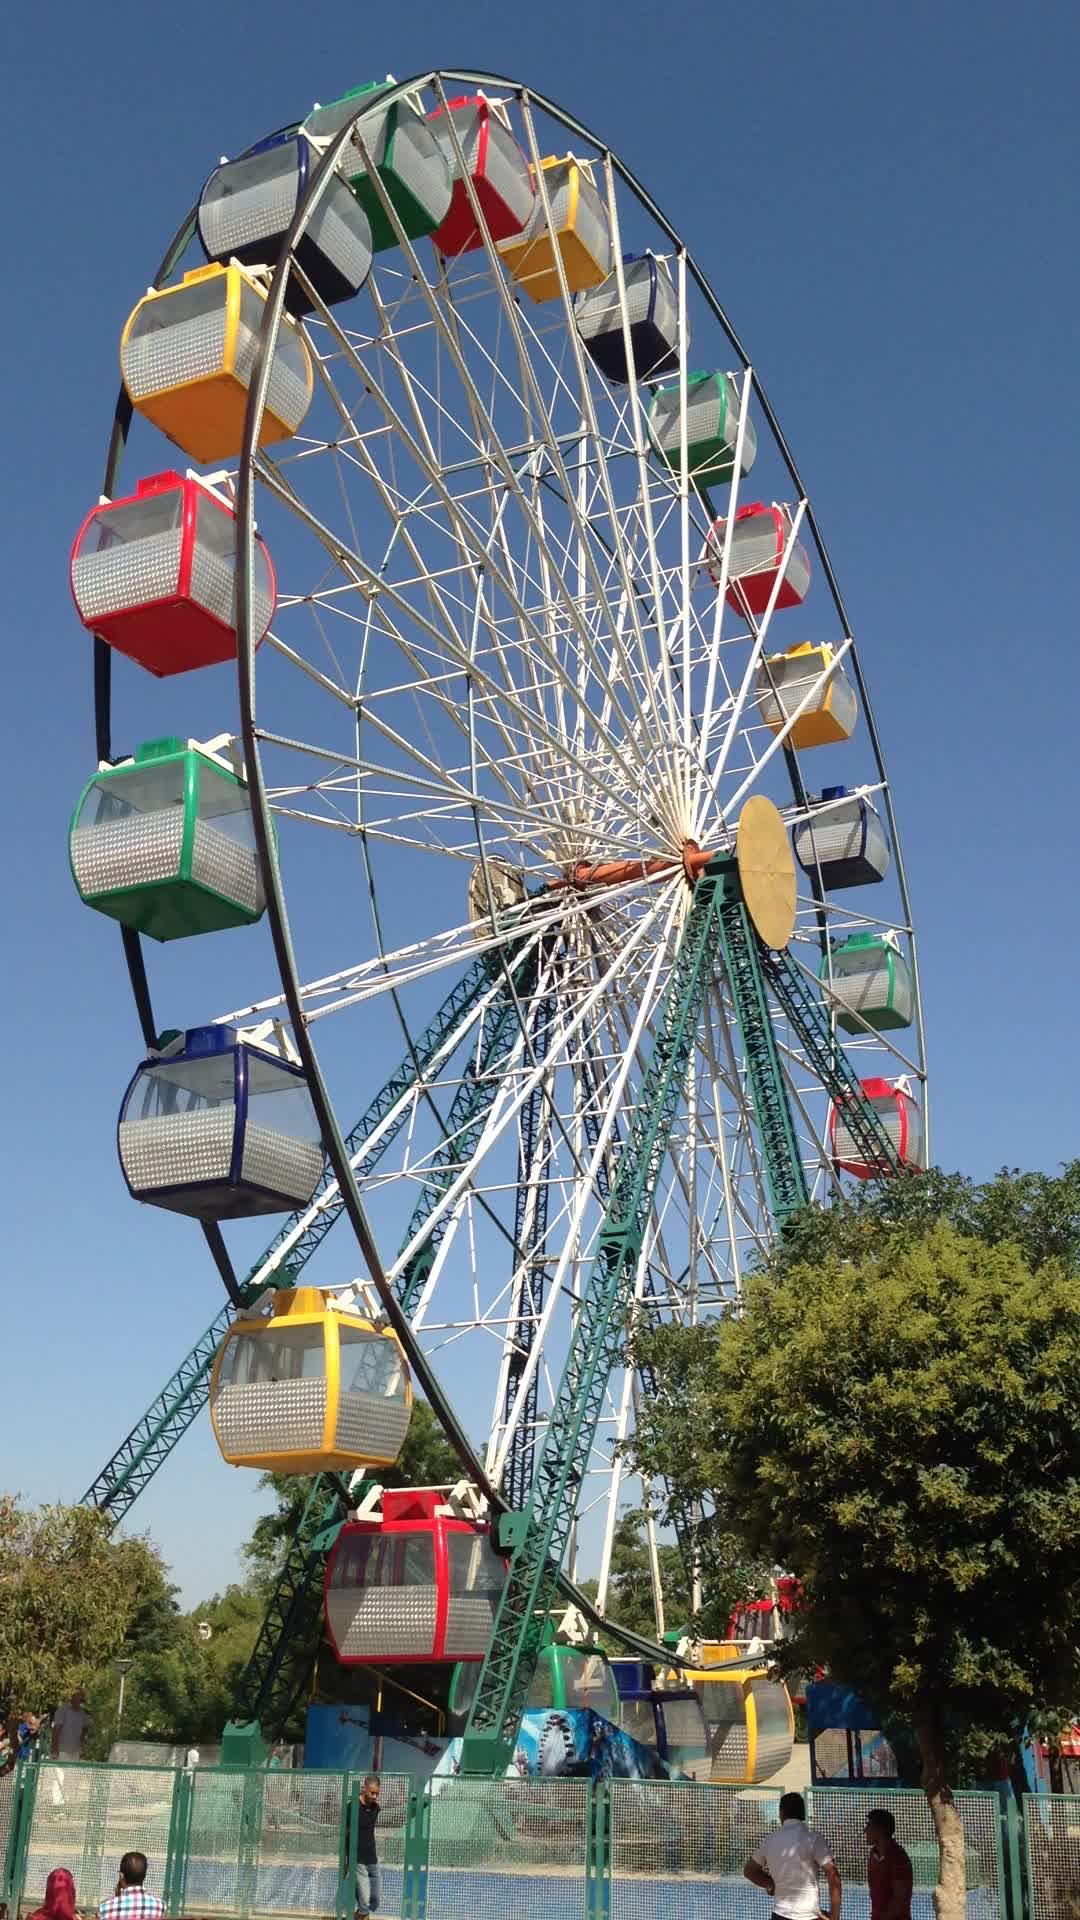 Parque temático Passeio de Parque de Diversões Roda Gigante 30 Medidor (30 m) Elétrico Roda Gigante